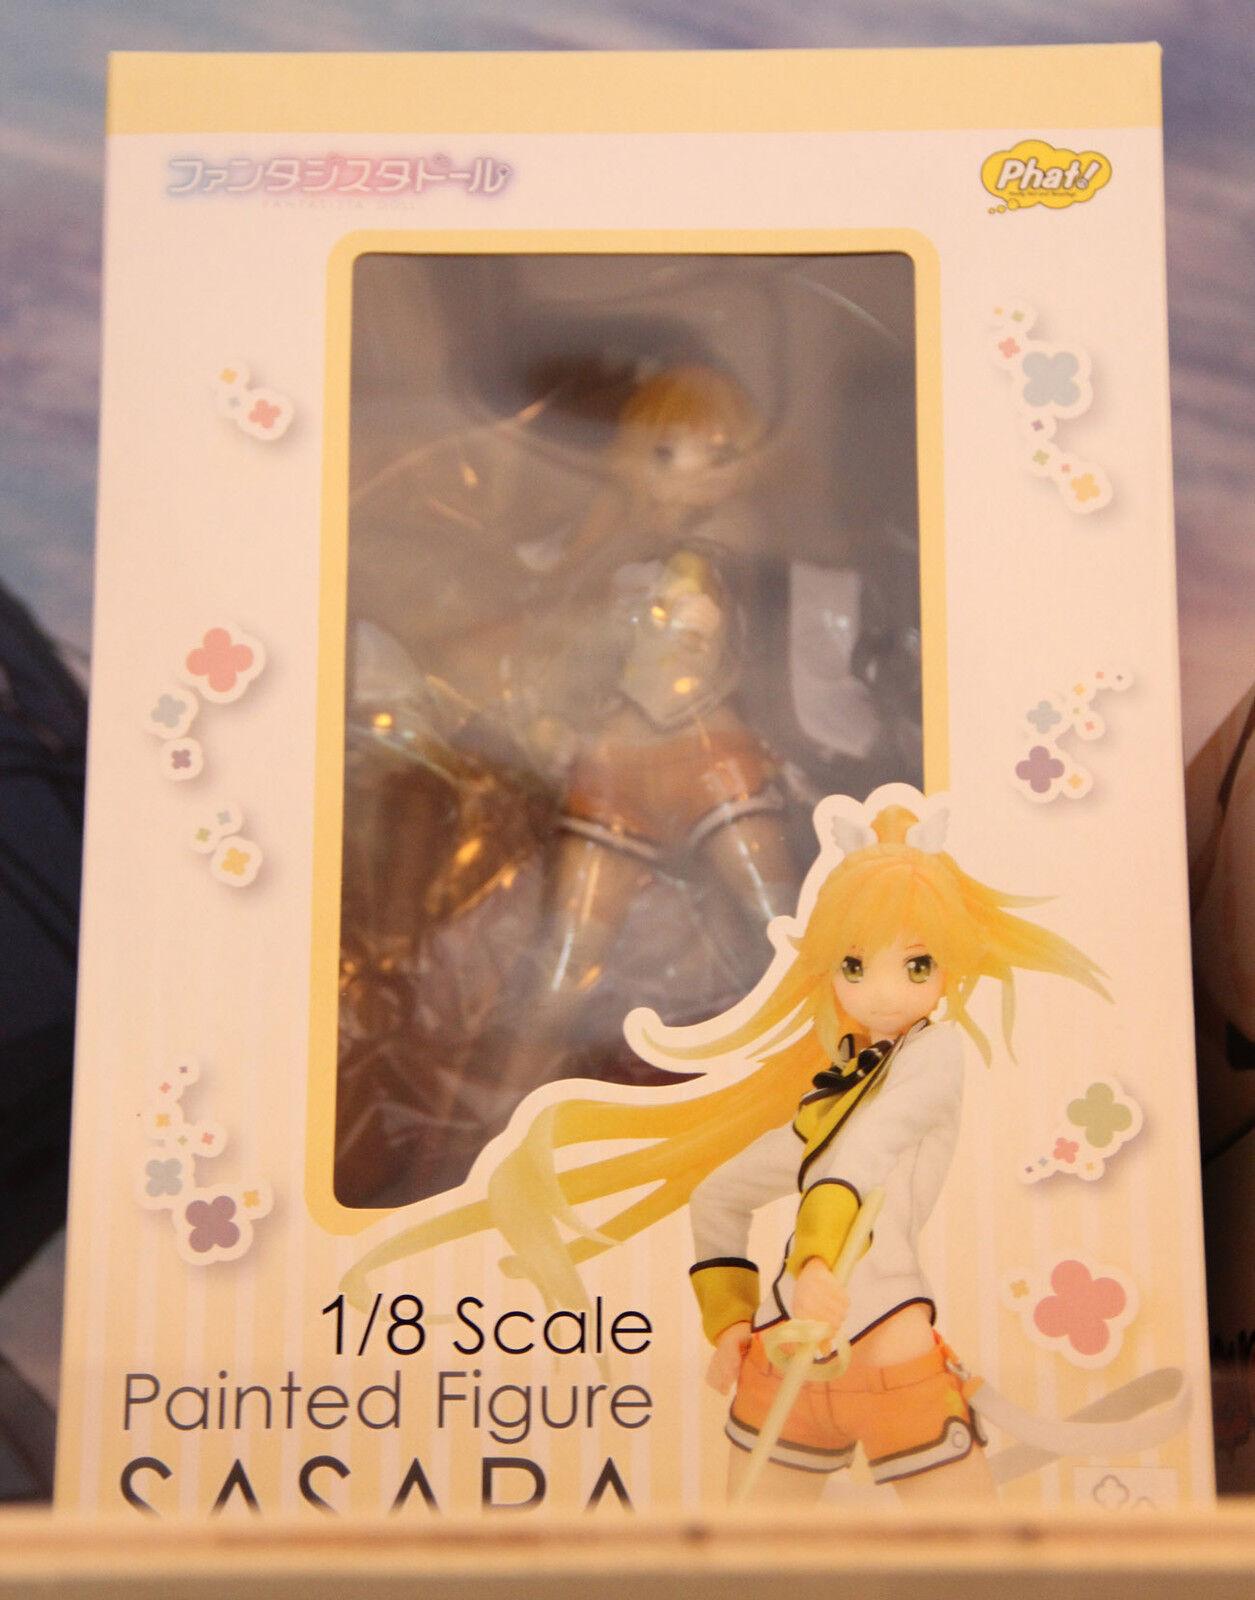 Fantasista Doll - Sasara 1 8 Phat Company PVC figure good smile